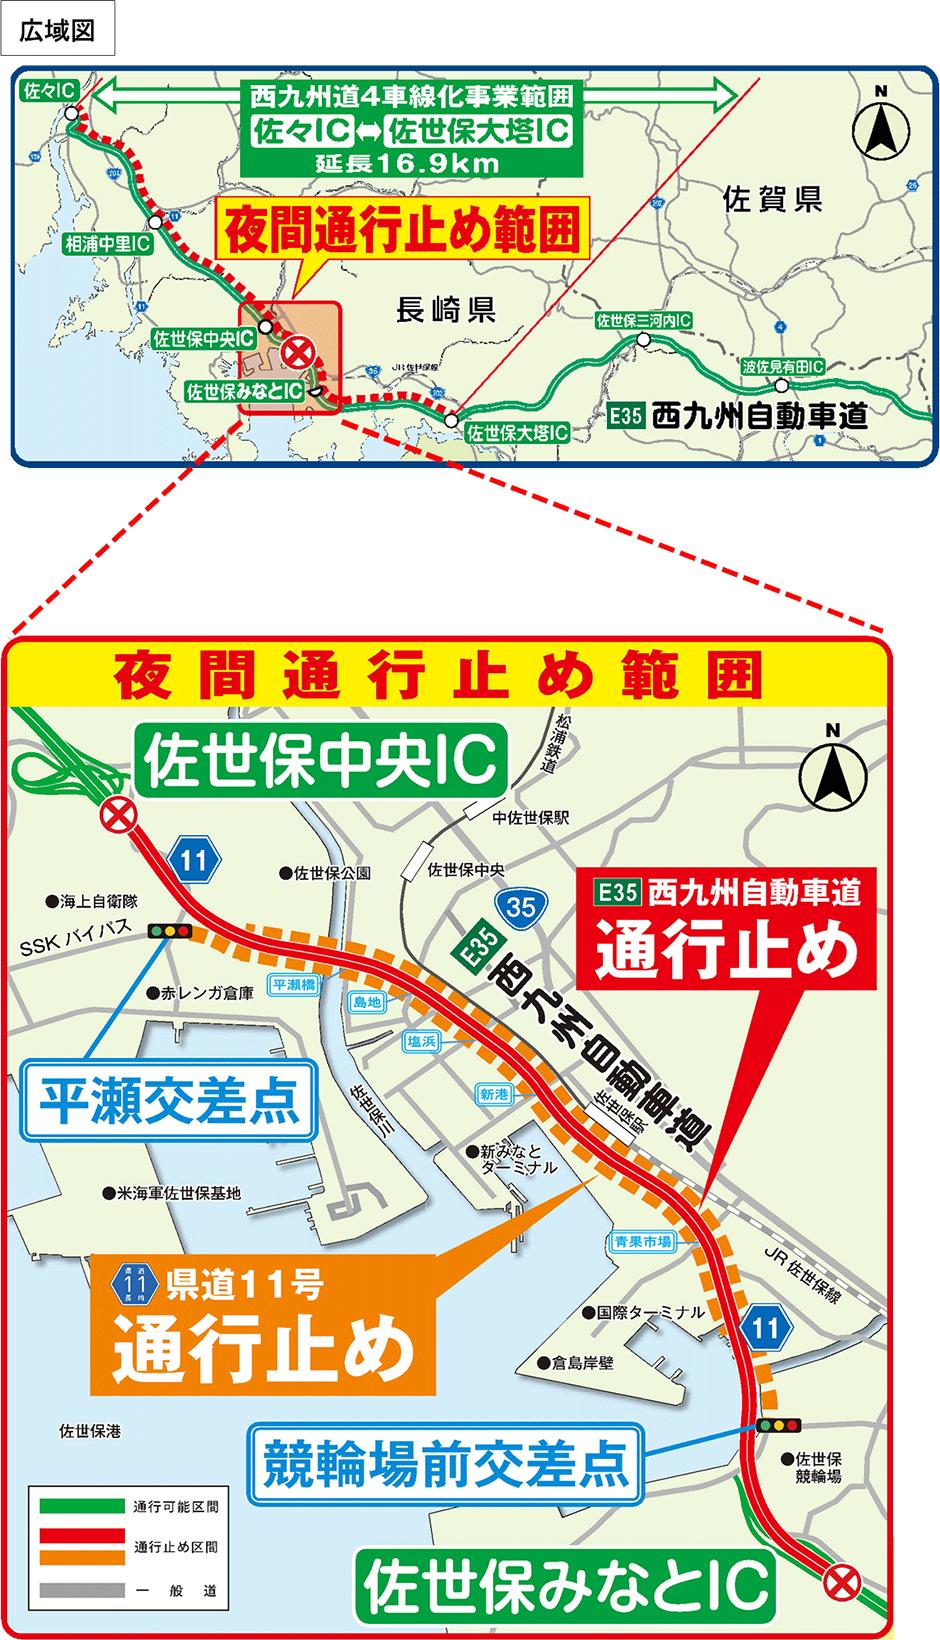 E35 西九州自動車道(佐世保中央IC~佐世保みなとIC間)ならびに県道11 ...